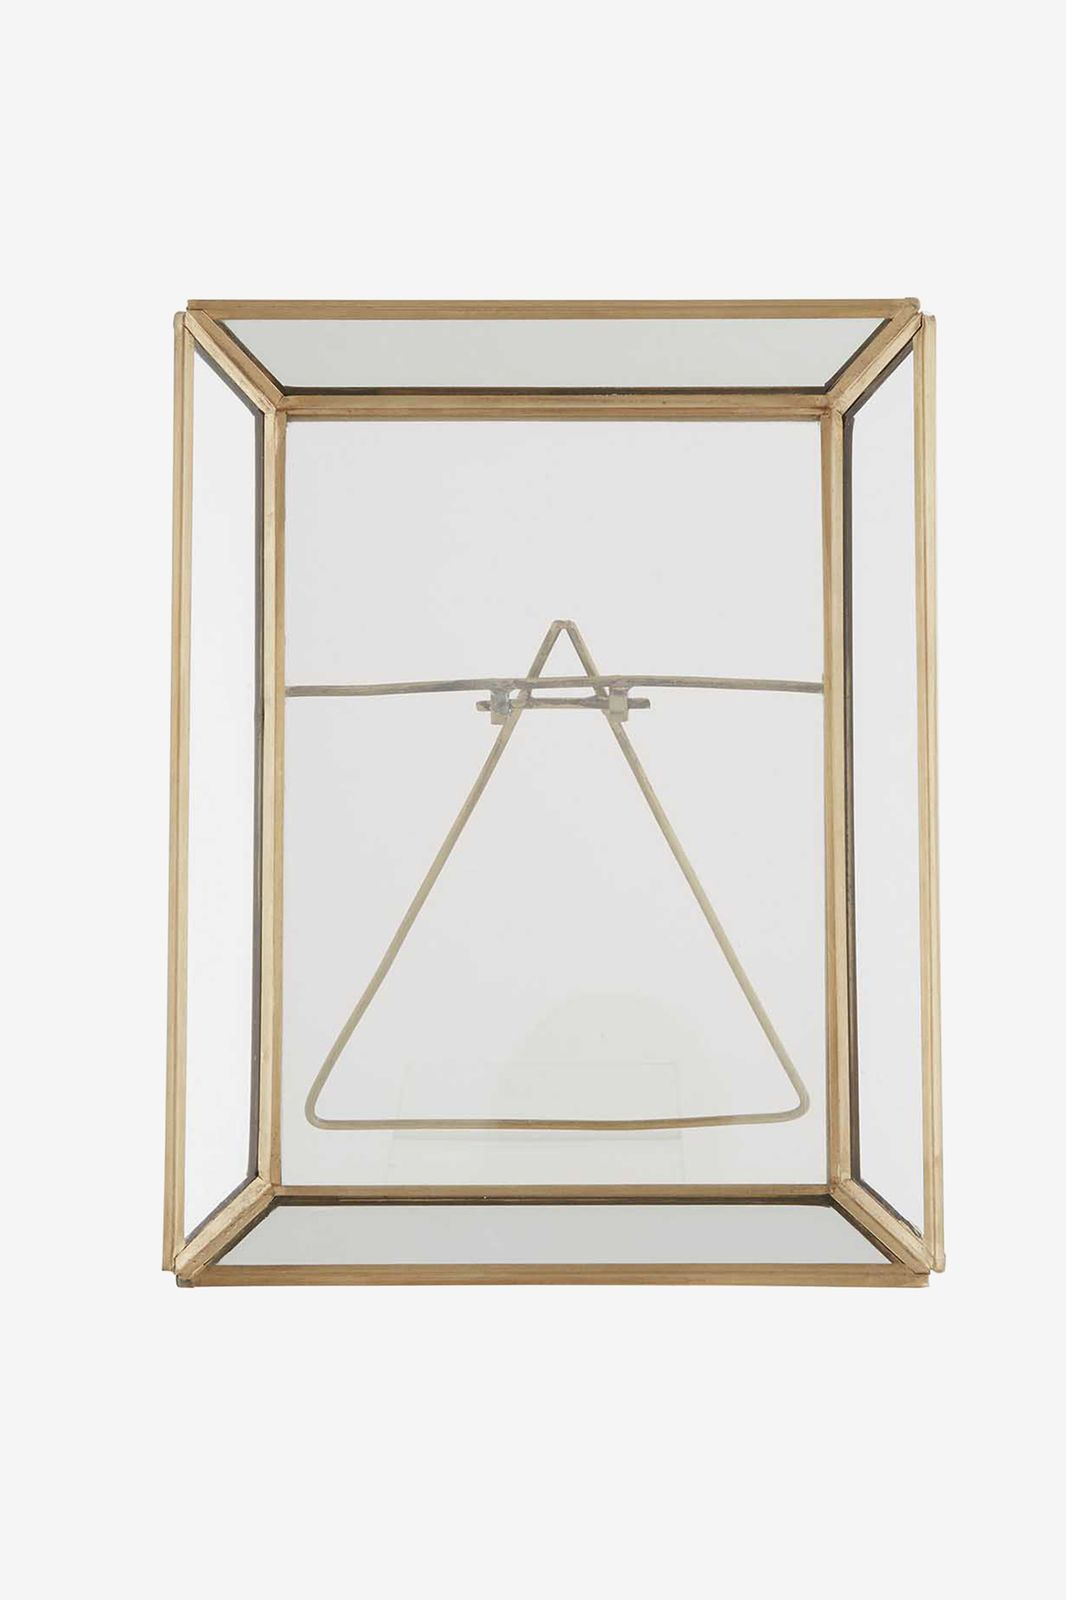 Fotolijst spiegel goud (17x11 cm) - Homeland | Sissy-Boy